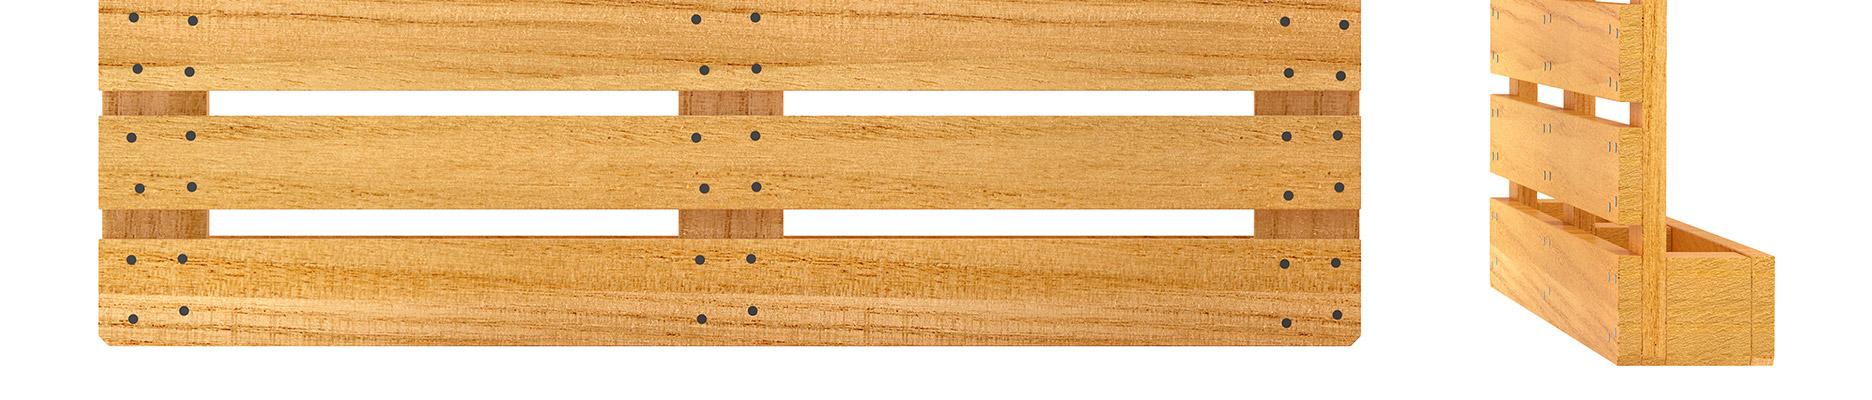 custom wood pallets, ashland va